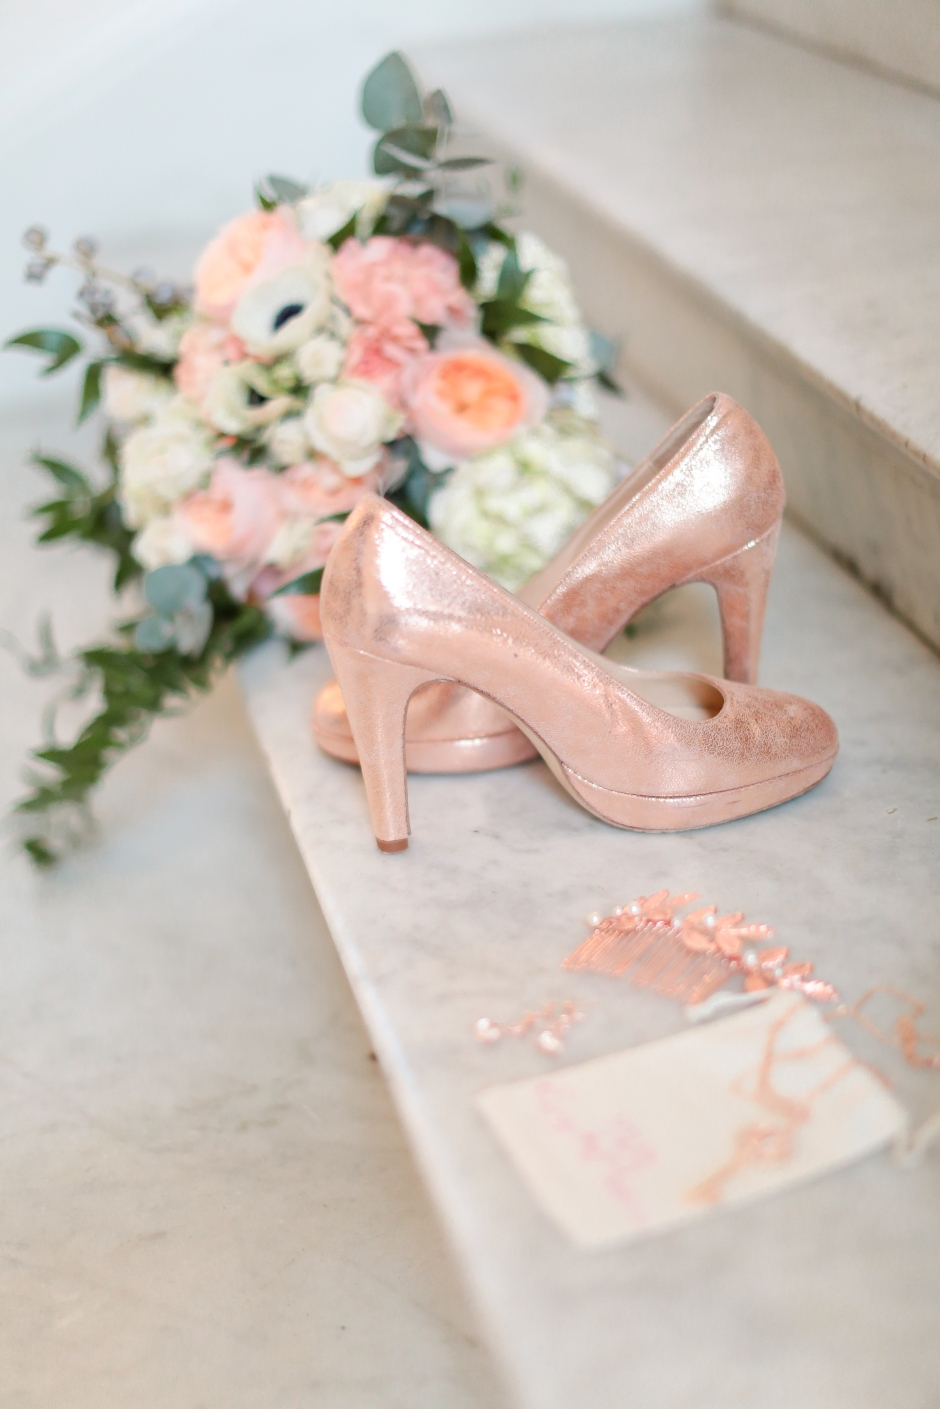 Mariage nude au Chateau de Santeny - La Blogueuse Mariage (37)